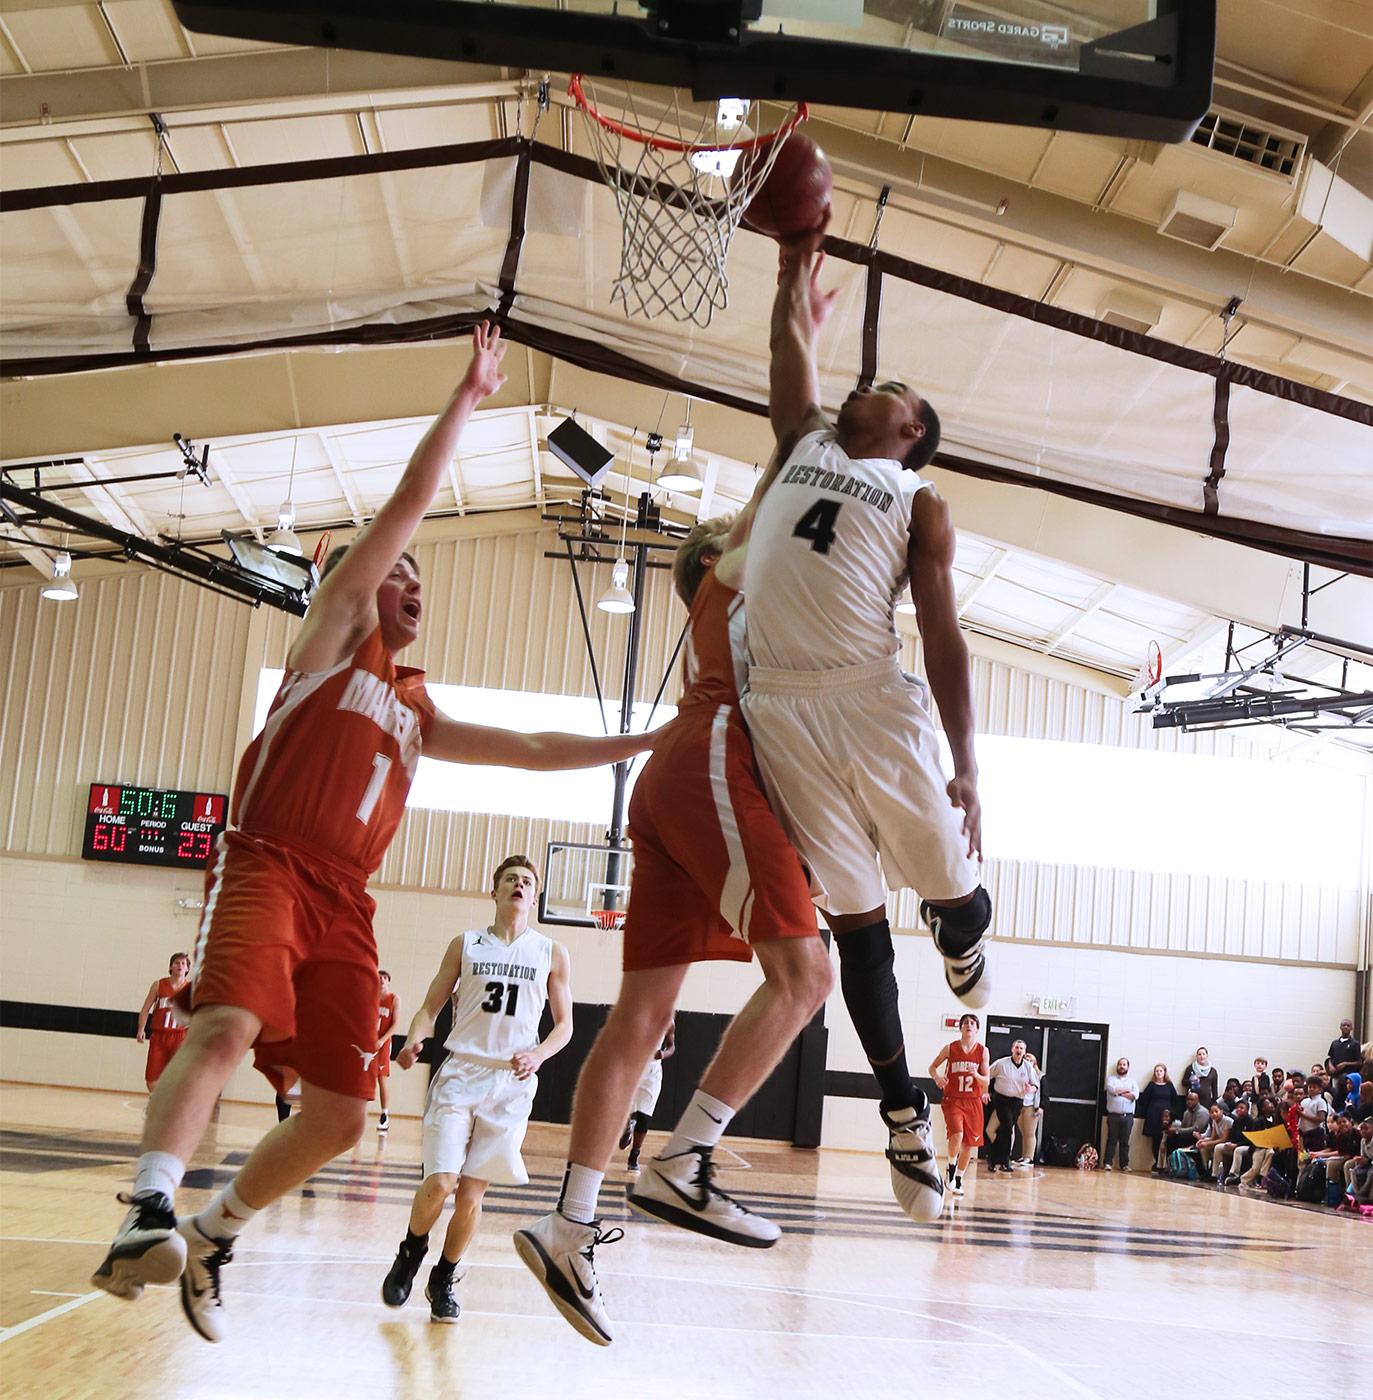 ra_basketball_dunk.jpg